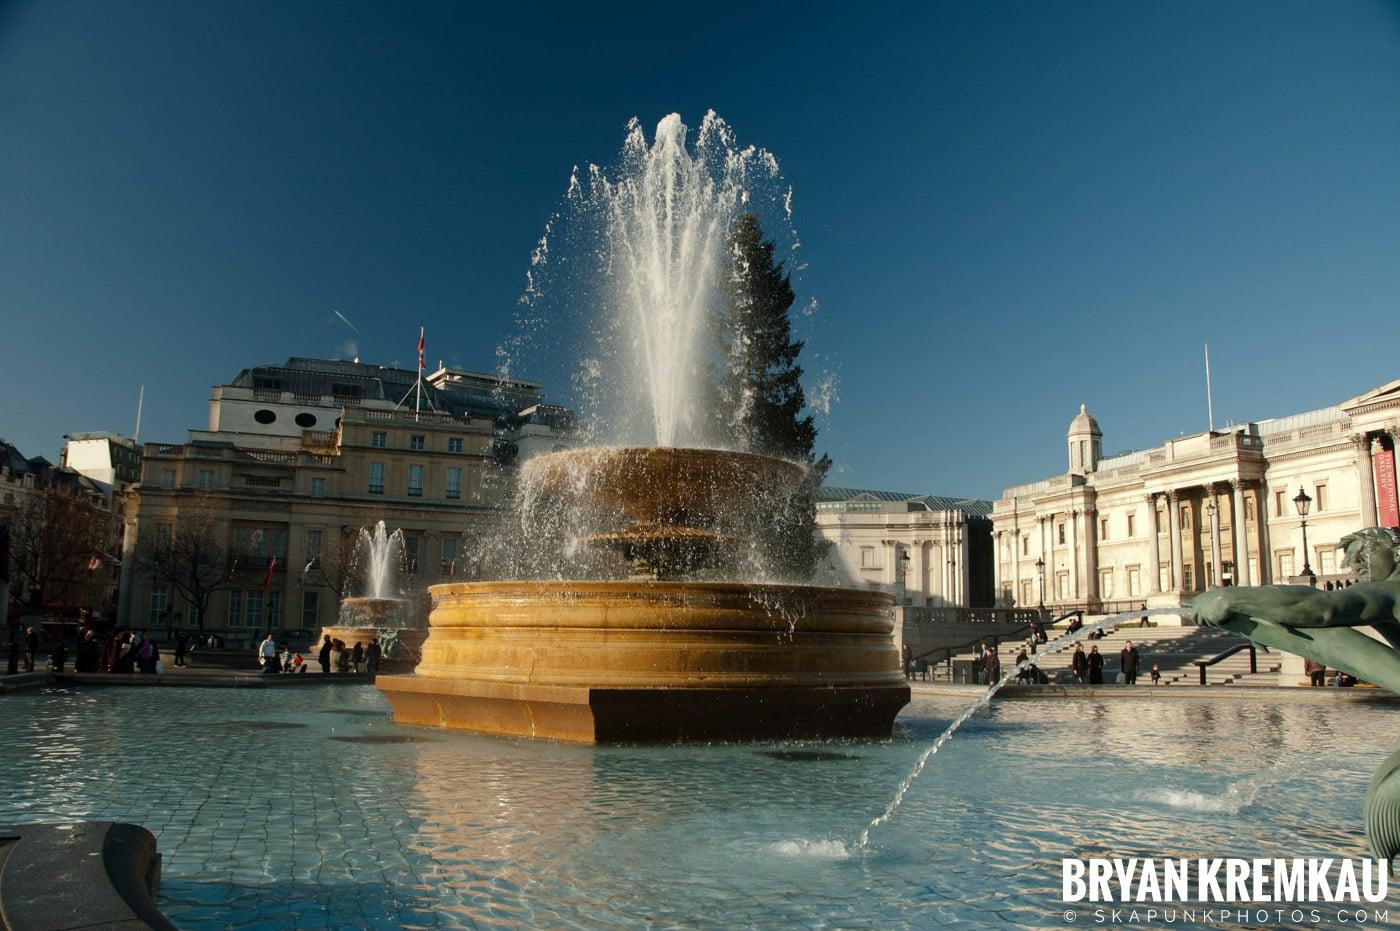 London, England - Day 5 - 12.17.06 (18)